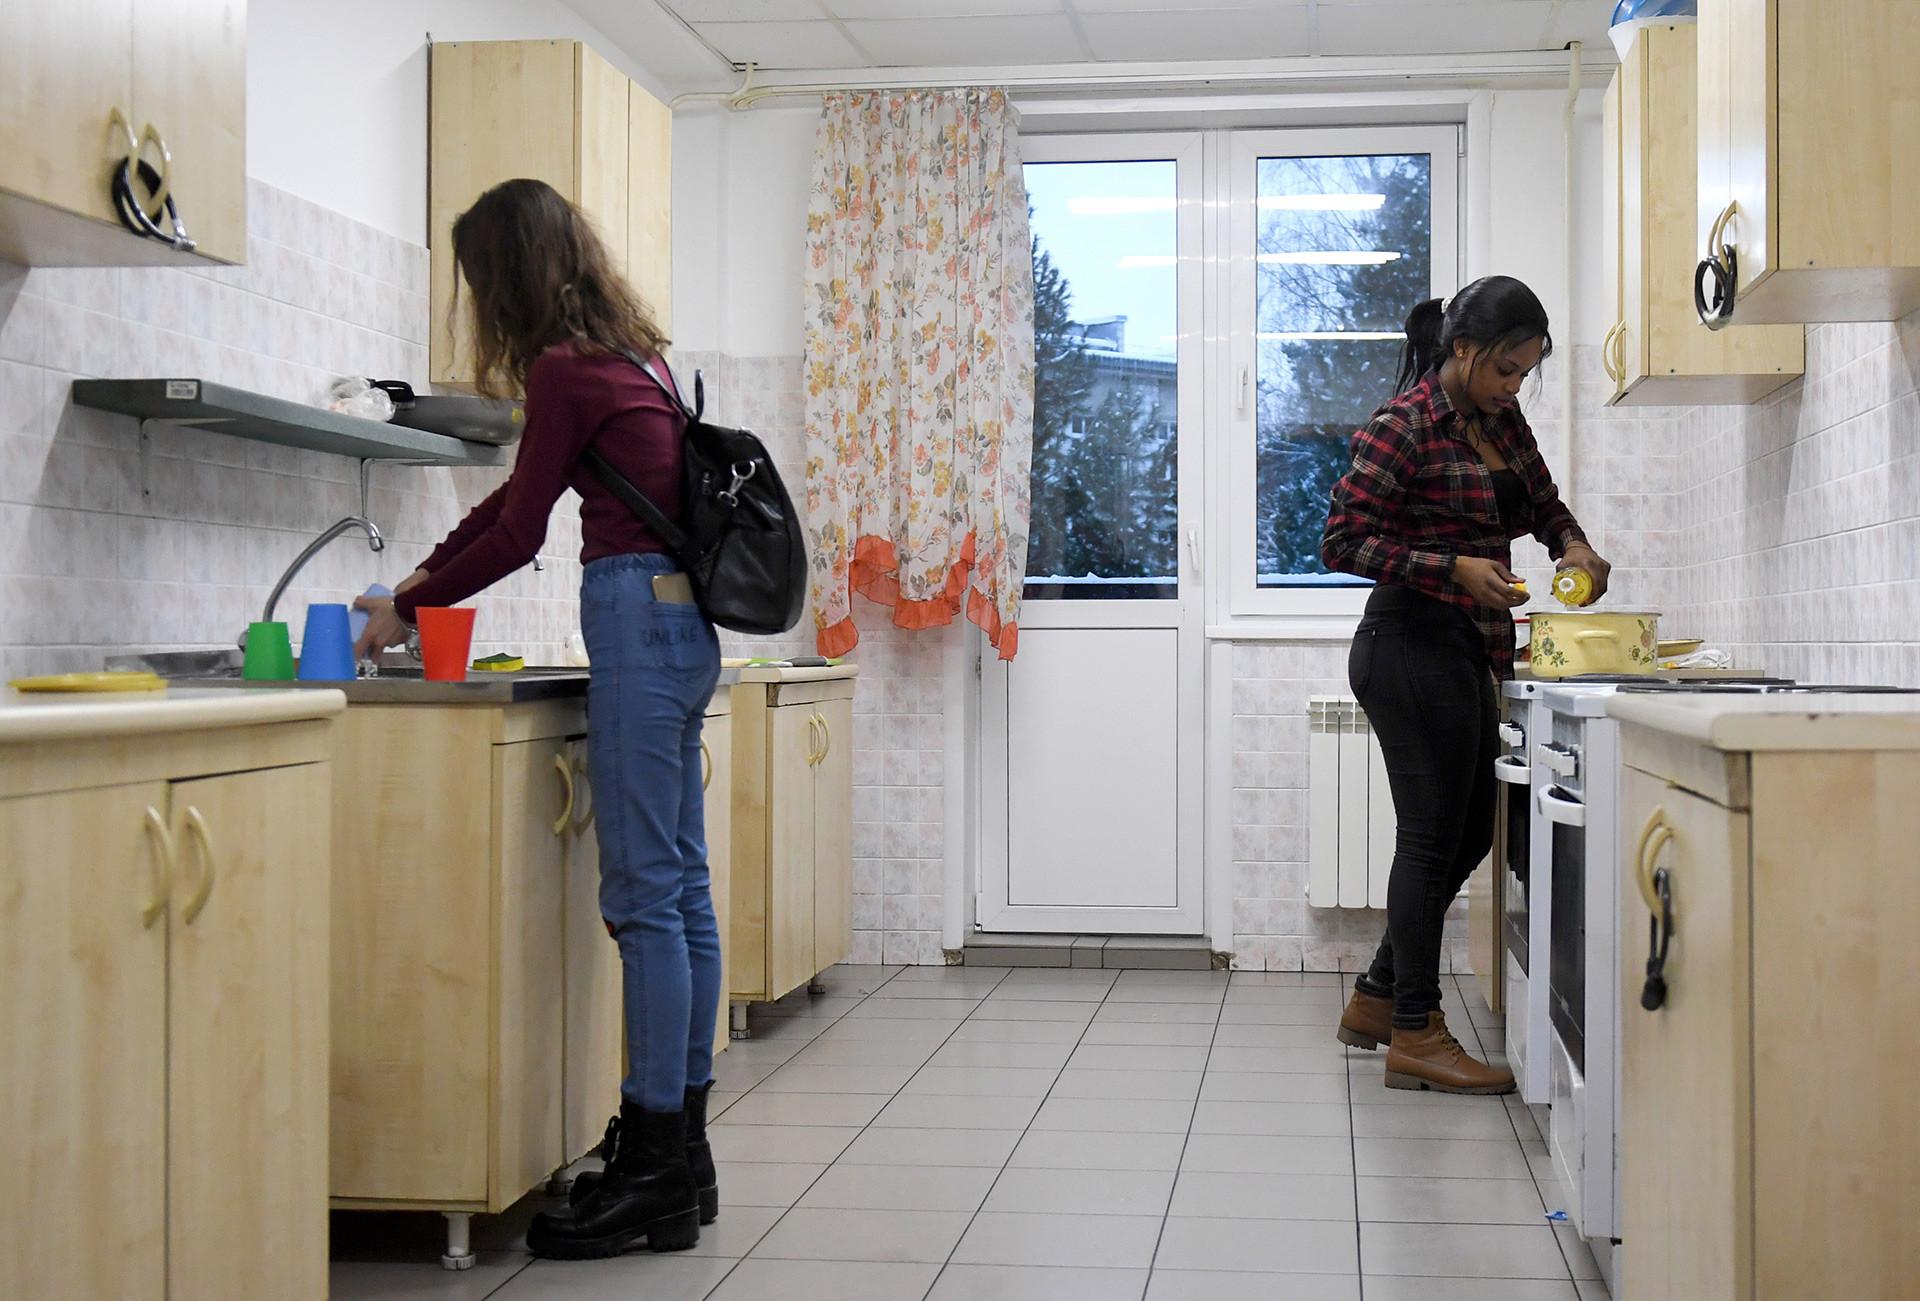 Dormitório estudantil na Rússia.